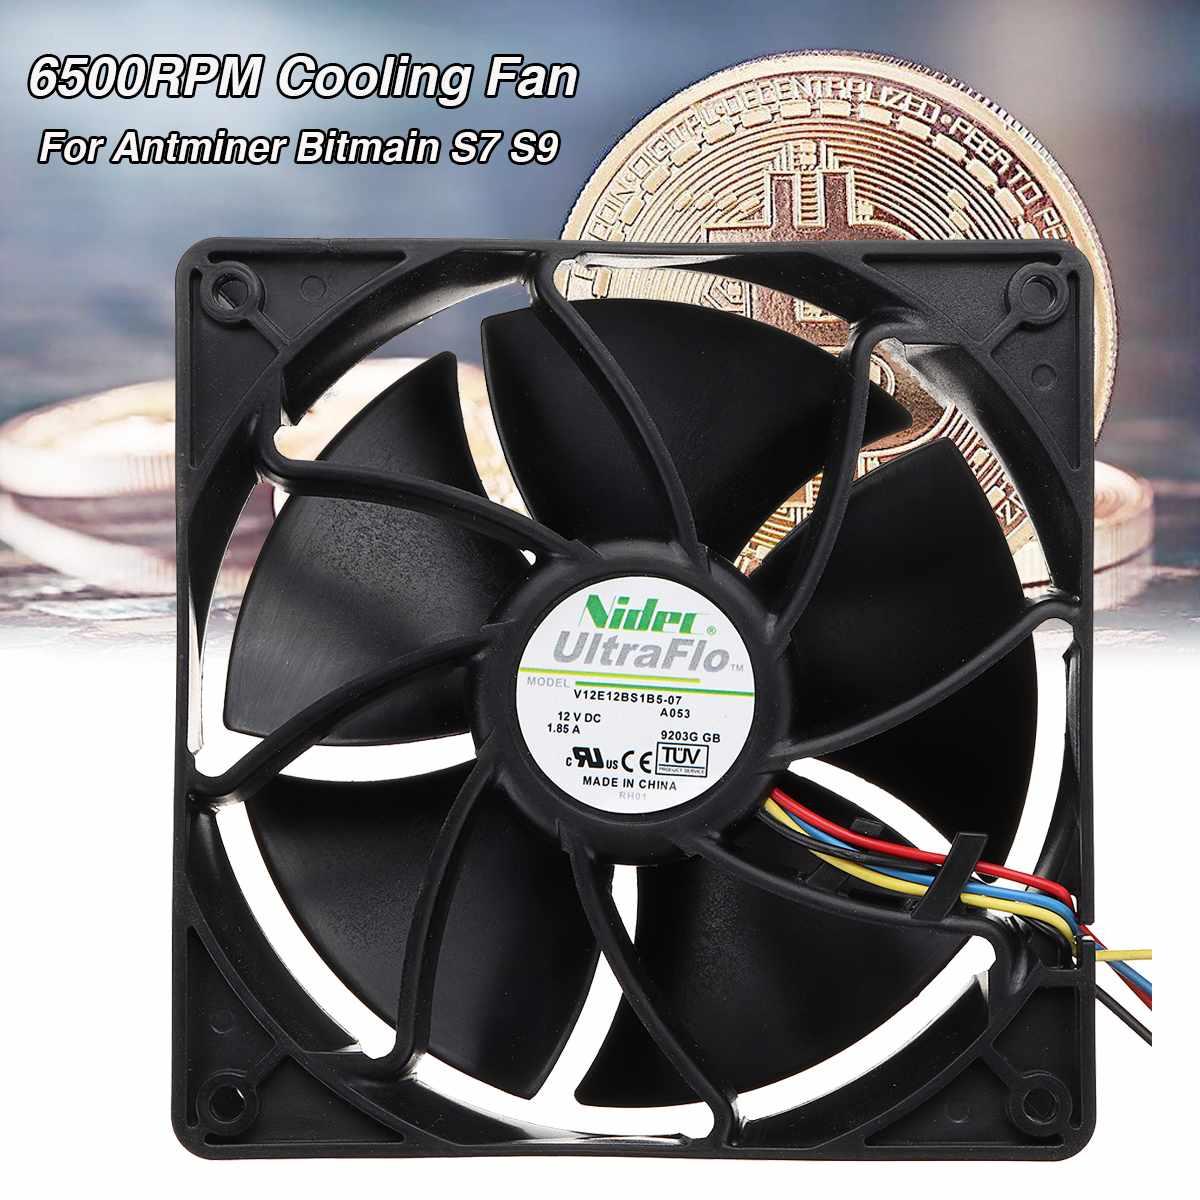 6500 RPM S7 S9 negro ordenador ventilador de refrigeración de la CPU Replacement 4-pin conector PWM Control de temperatura para Antminer Bitmain 12 V/1.85A